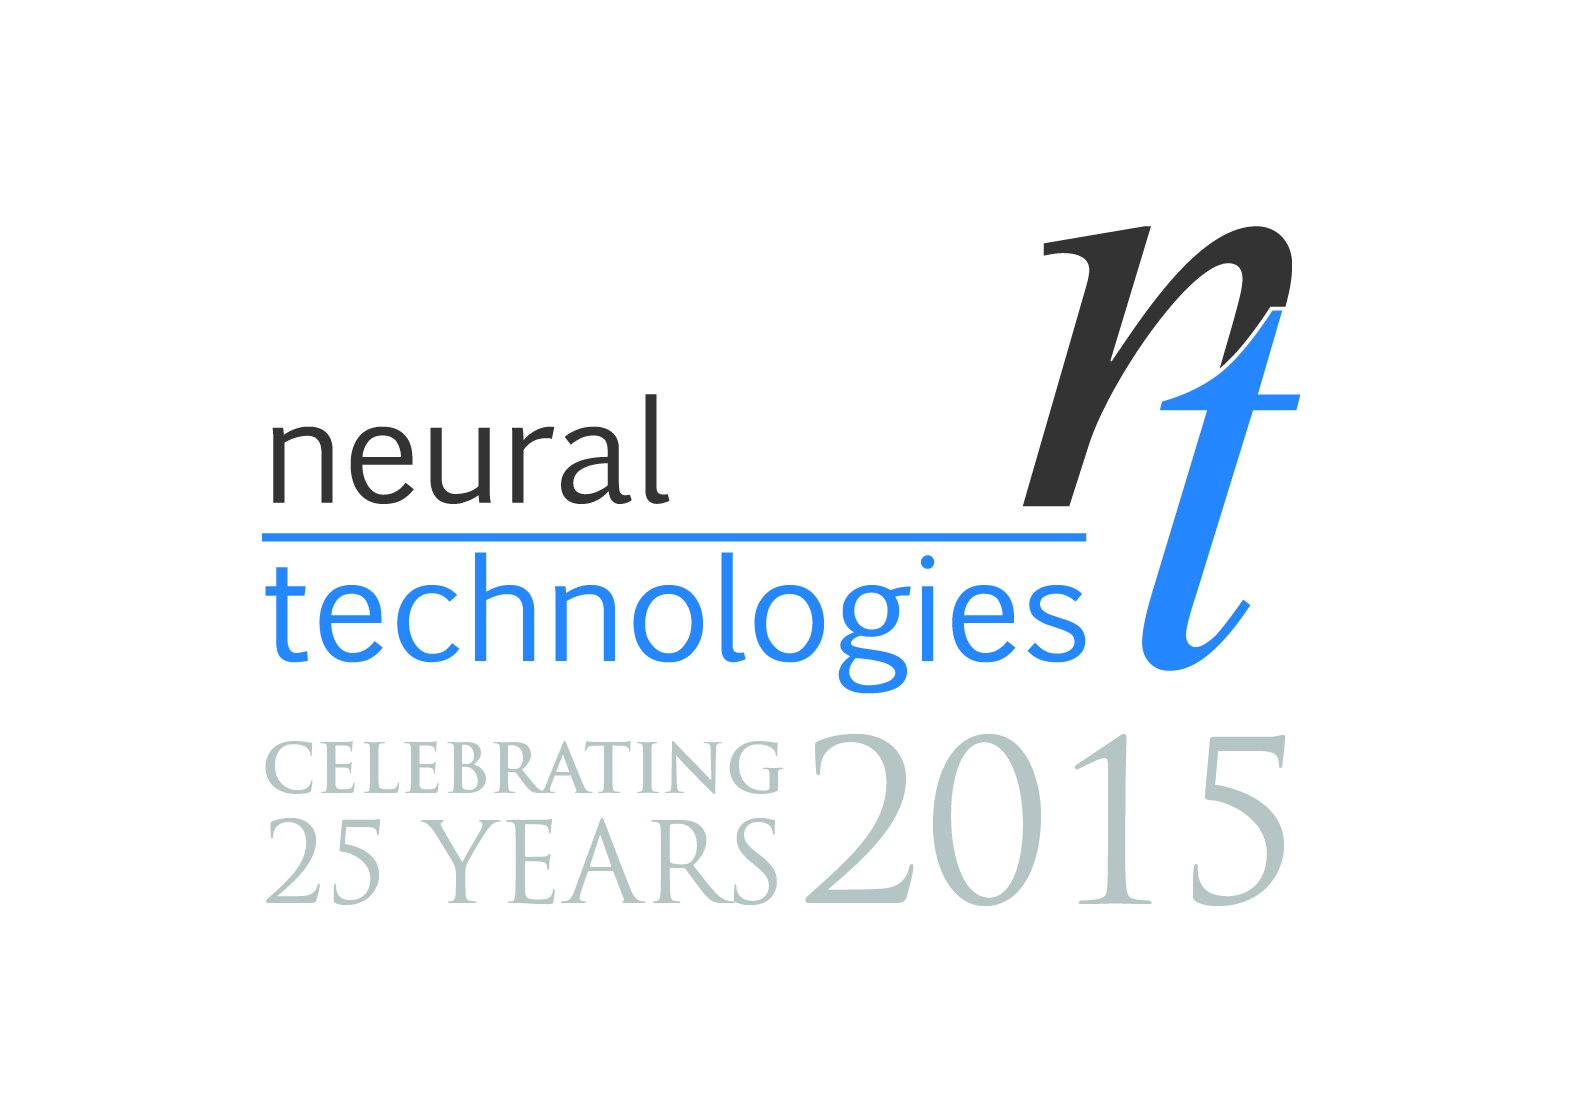 Nt-Logo-25th-anniversary.jpg